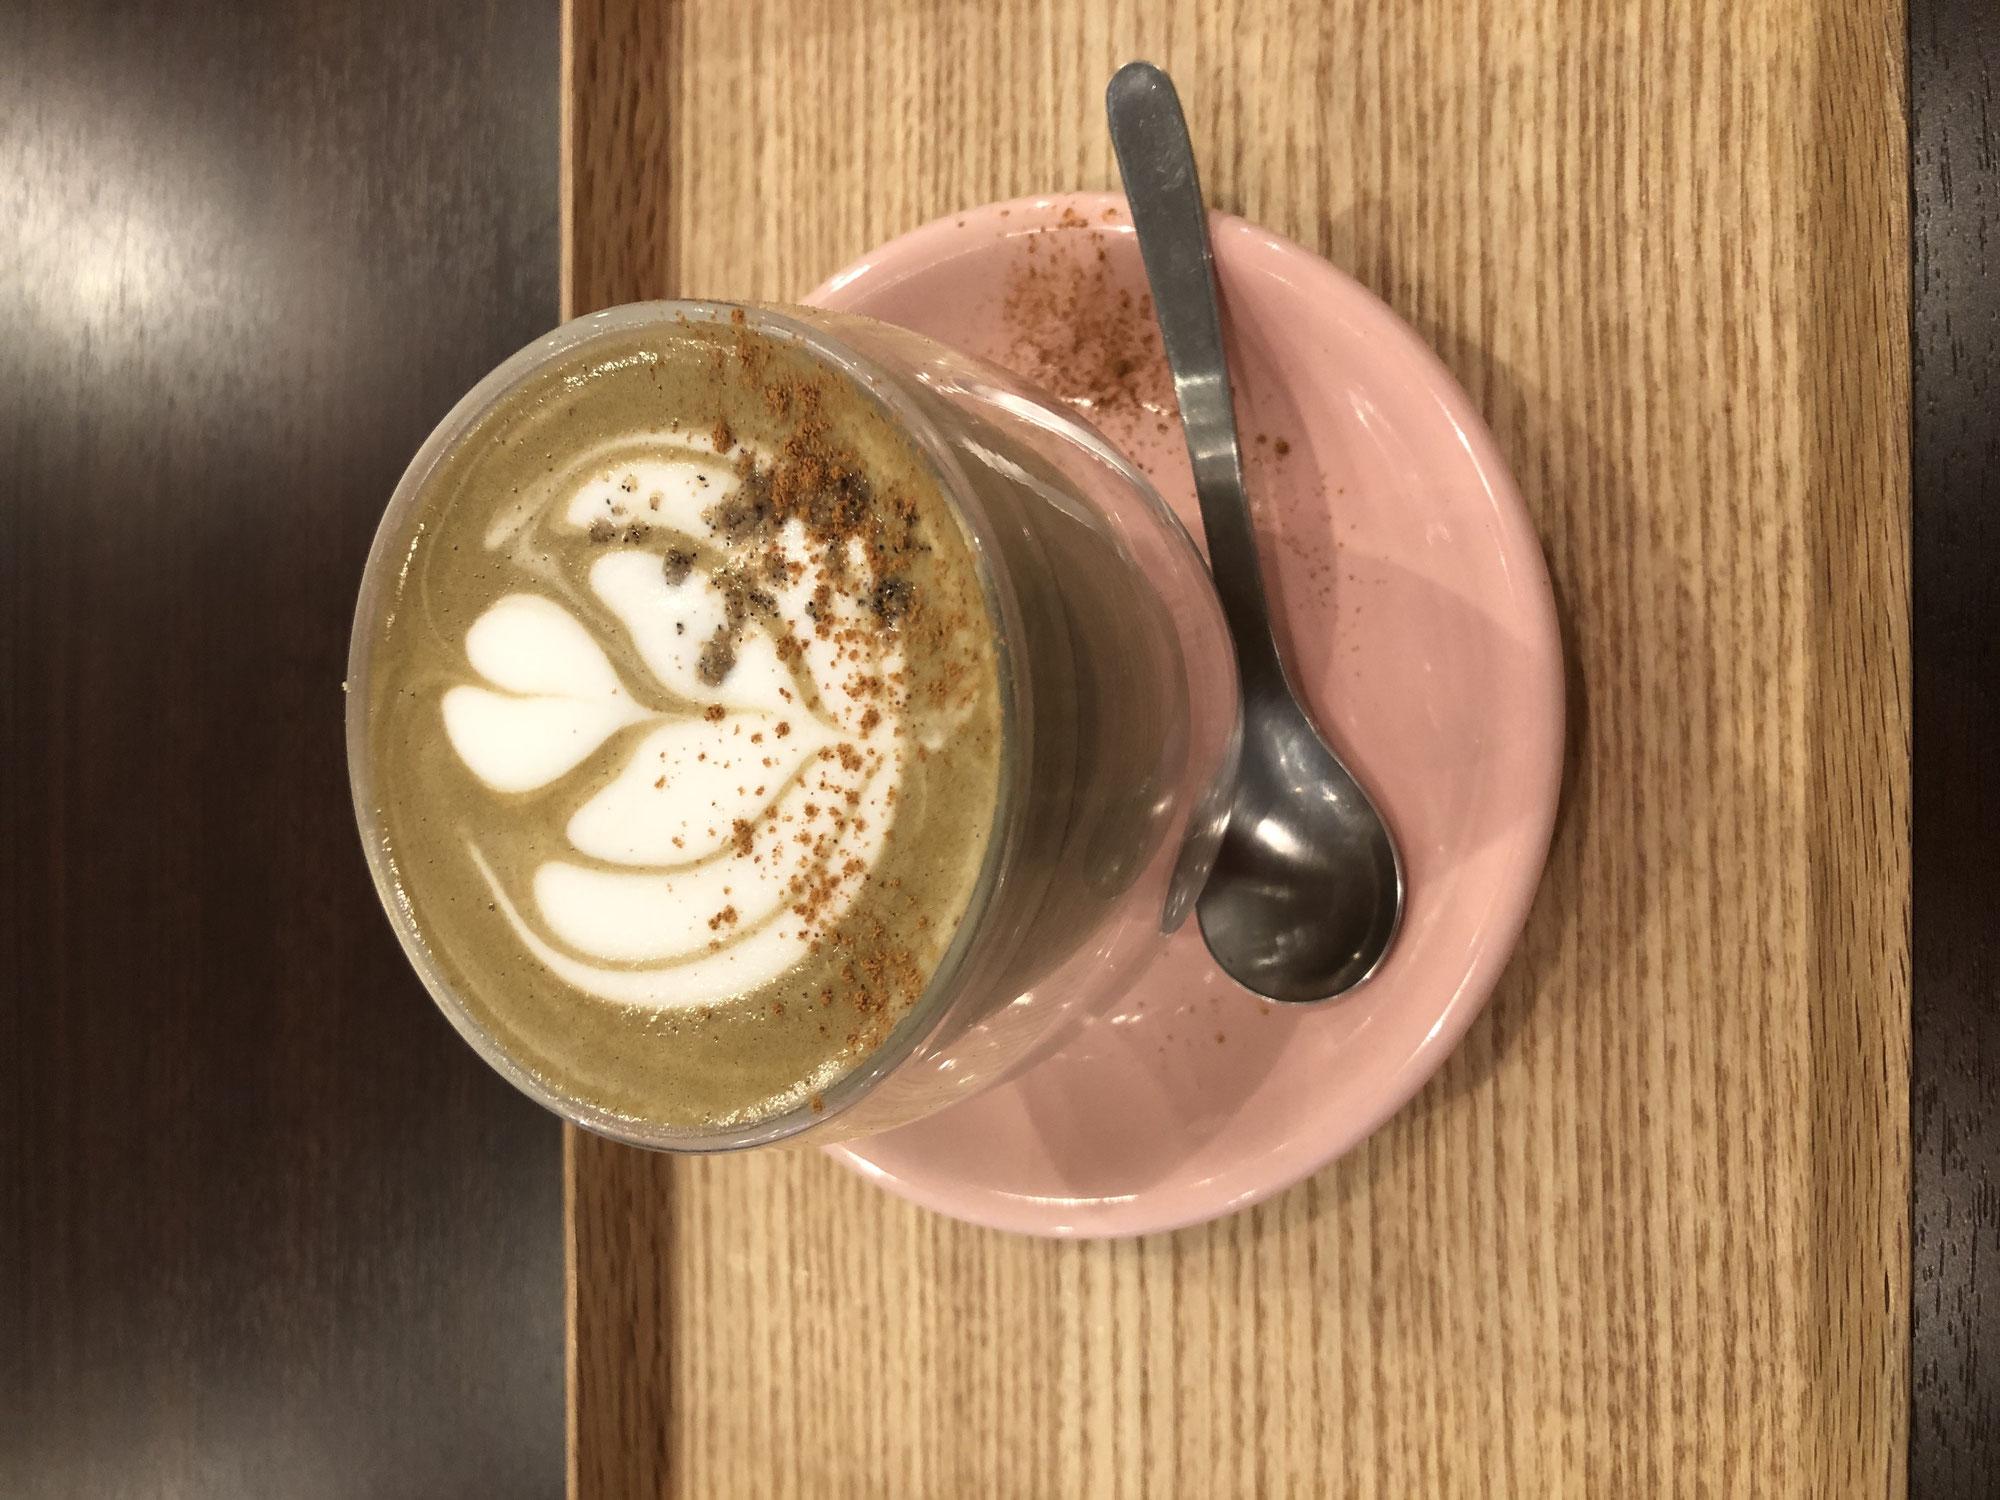 コーヒー中毒